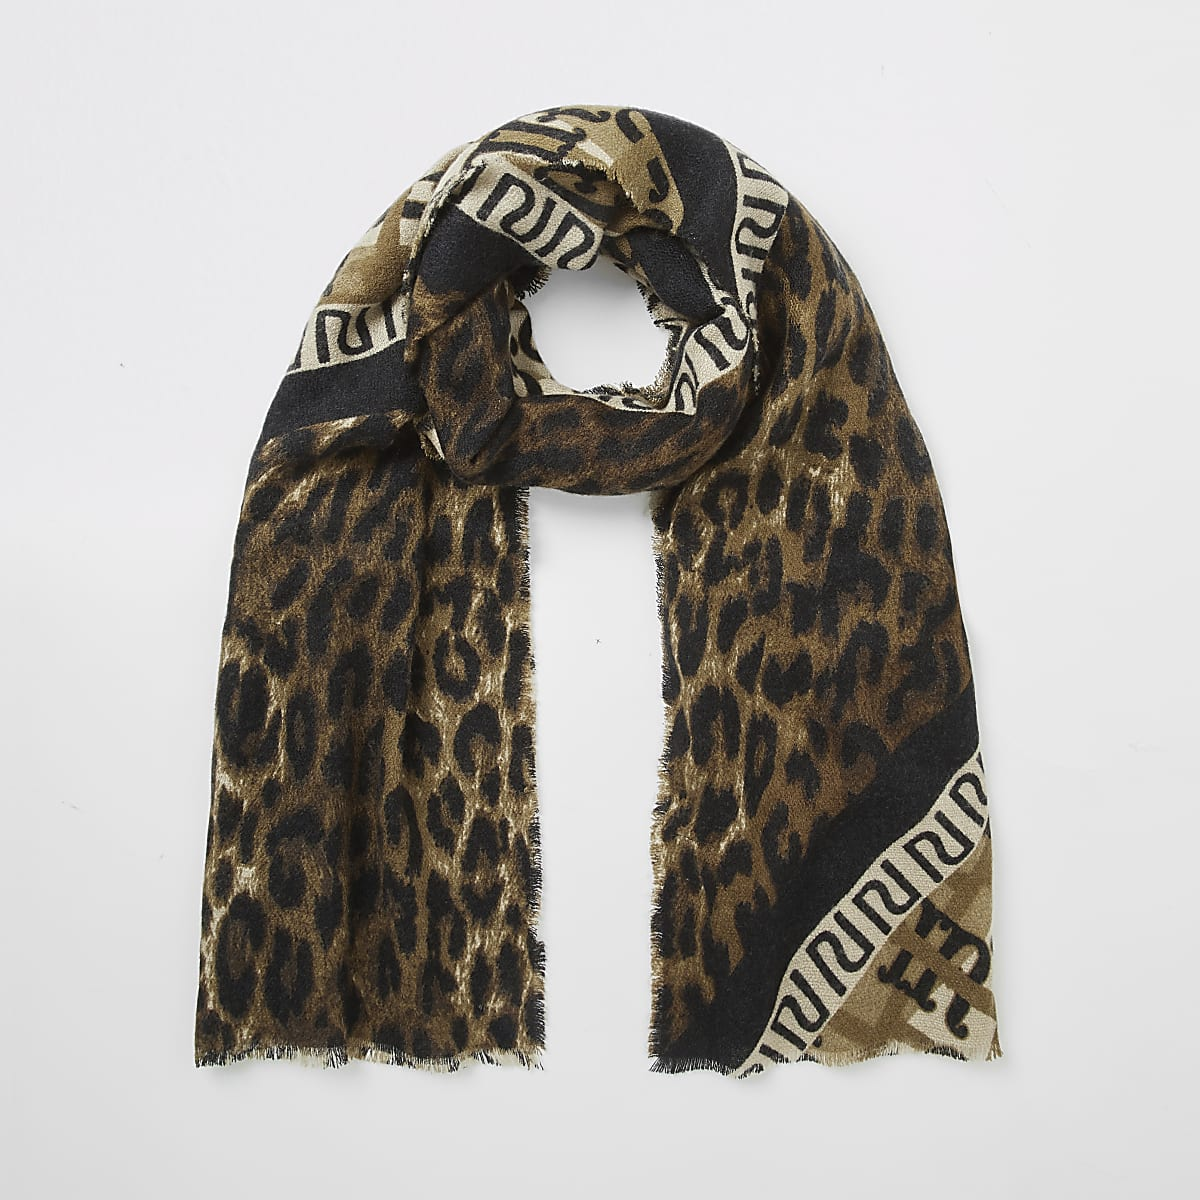 Bruine sjaal met RI-monogram en luipaardprint